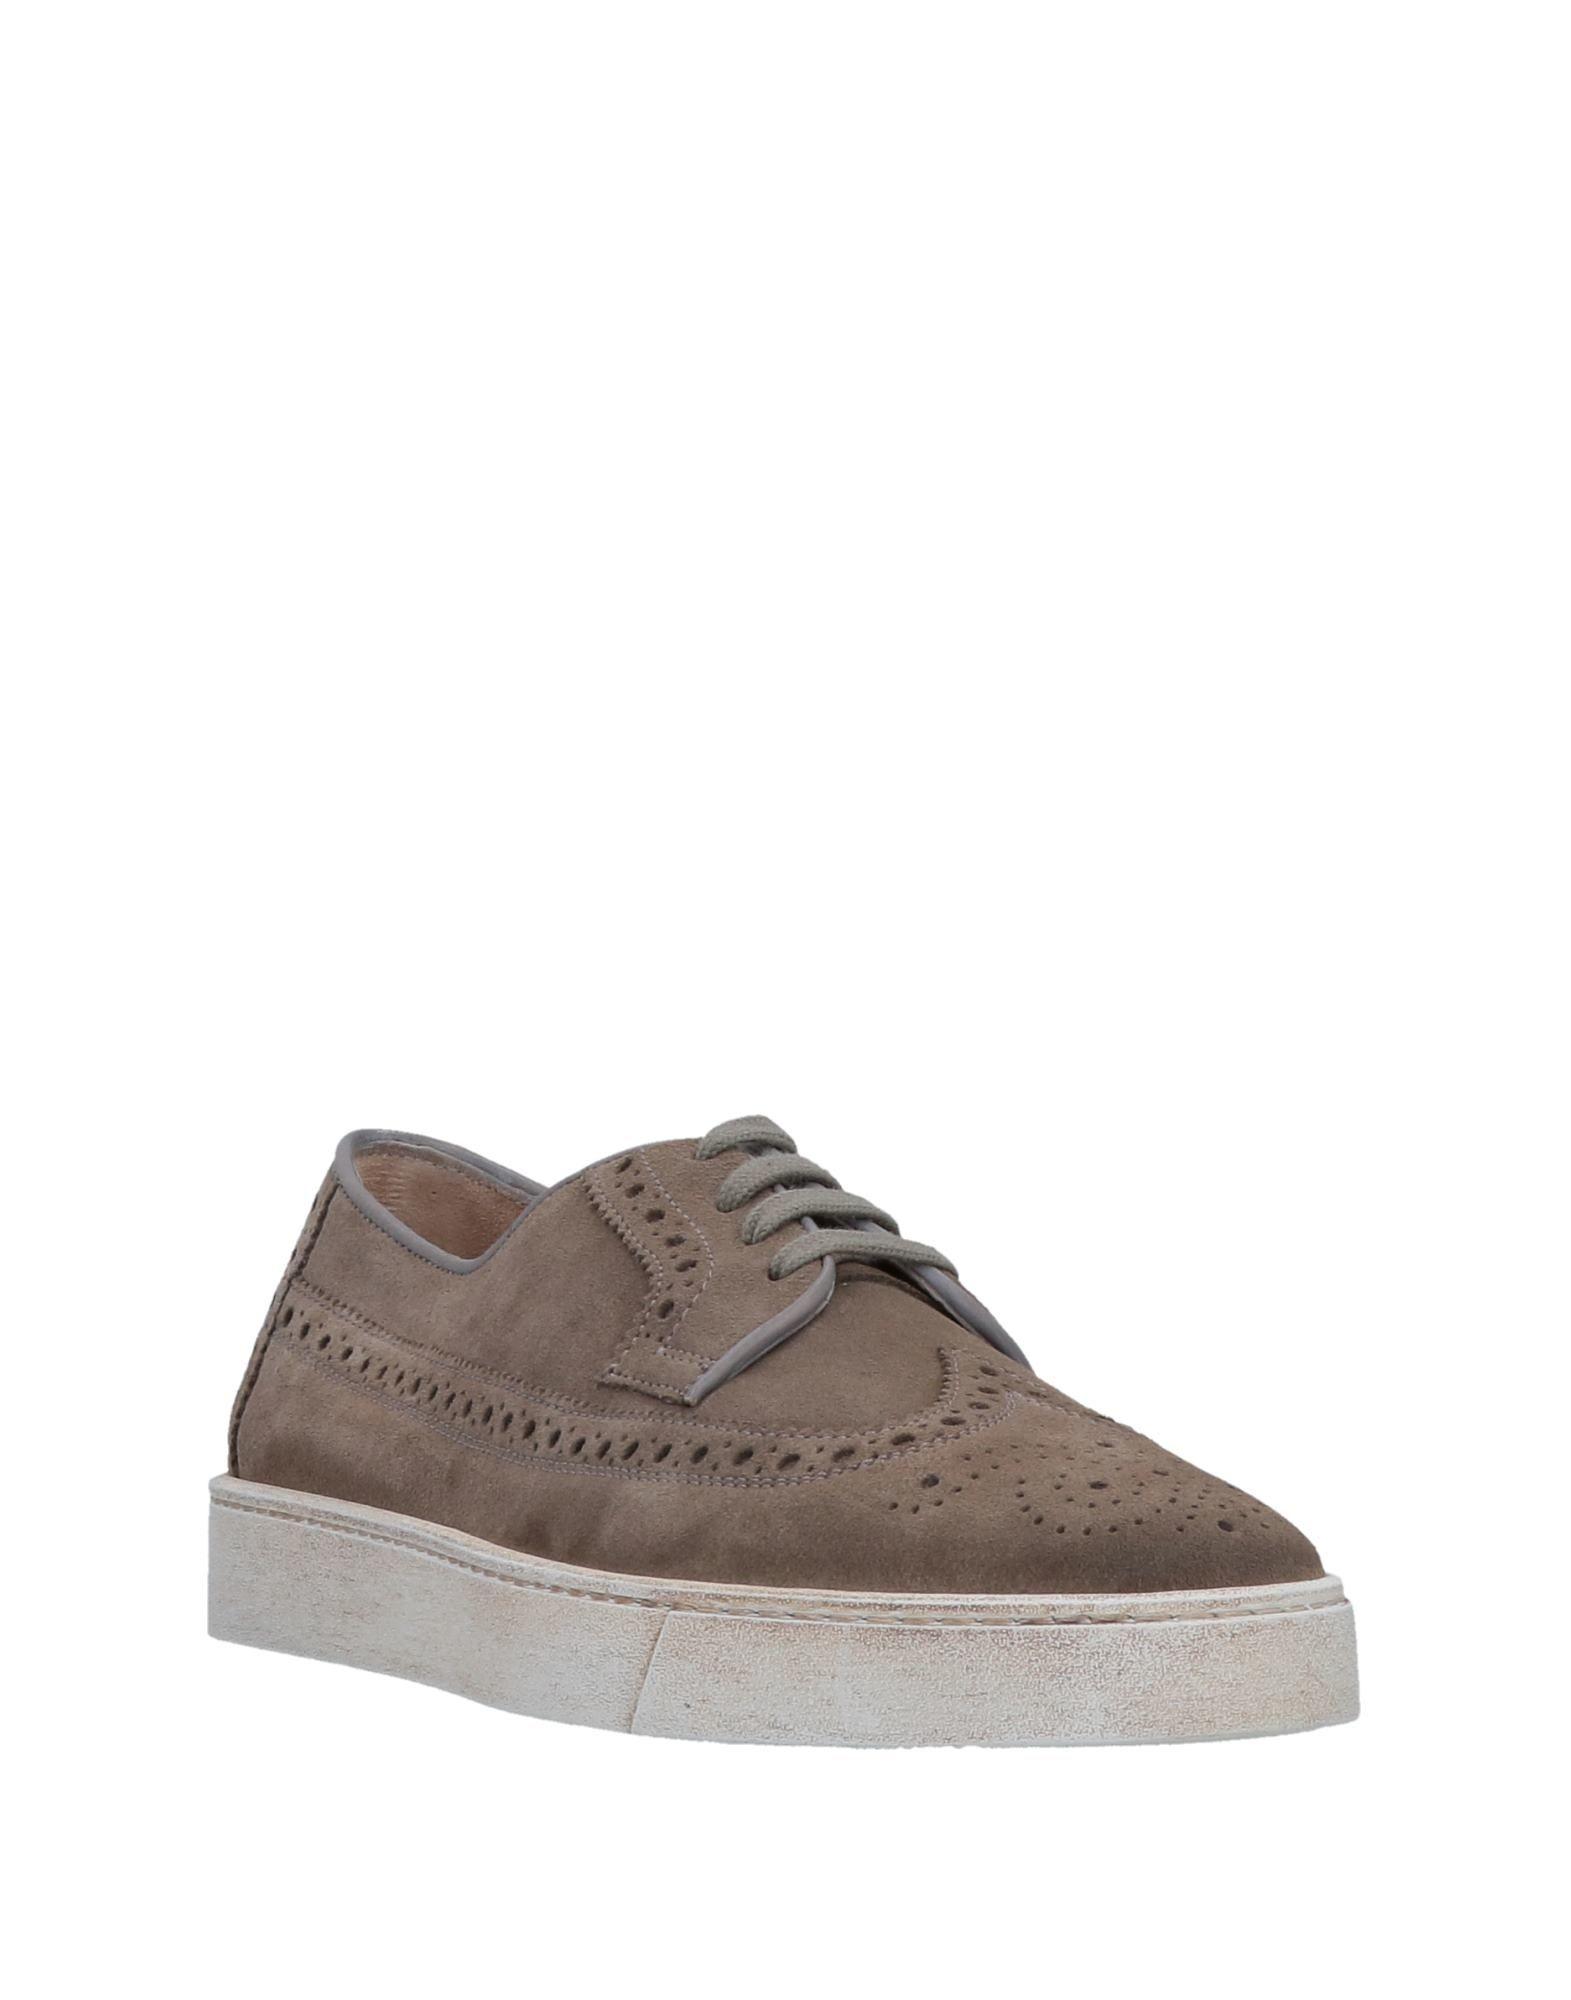 Santoni Schnürschuhe Gute Herren  11507117BG Gute Schnürschuhe Qualität beliebte Schuhe 8a5b64